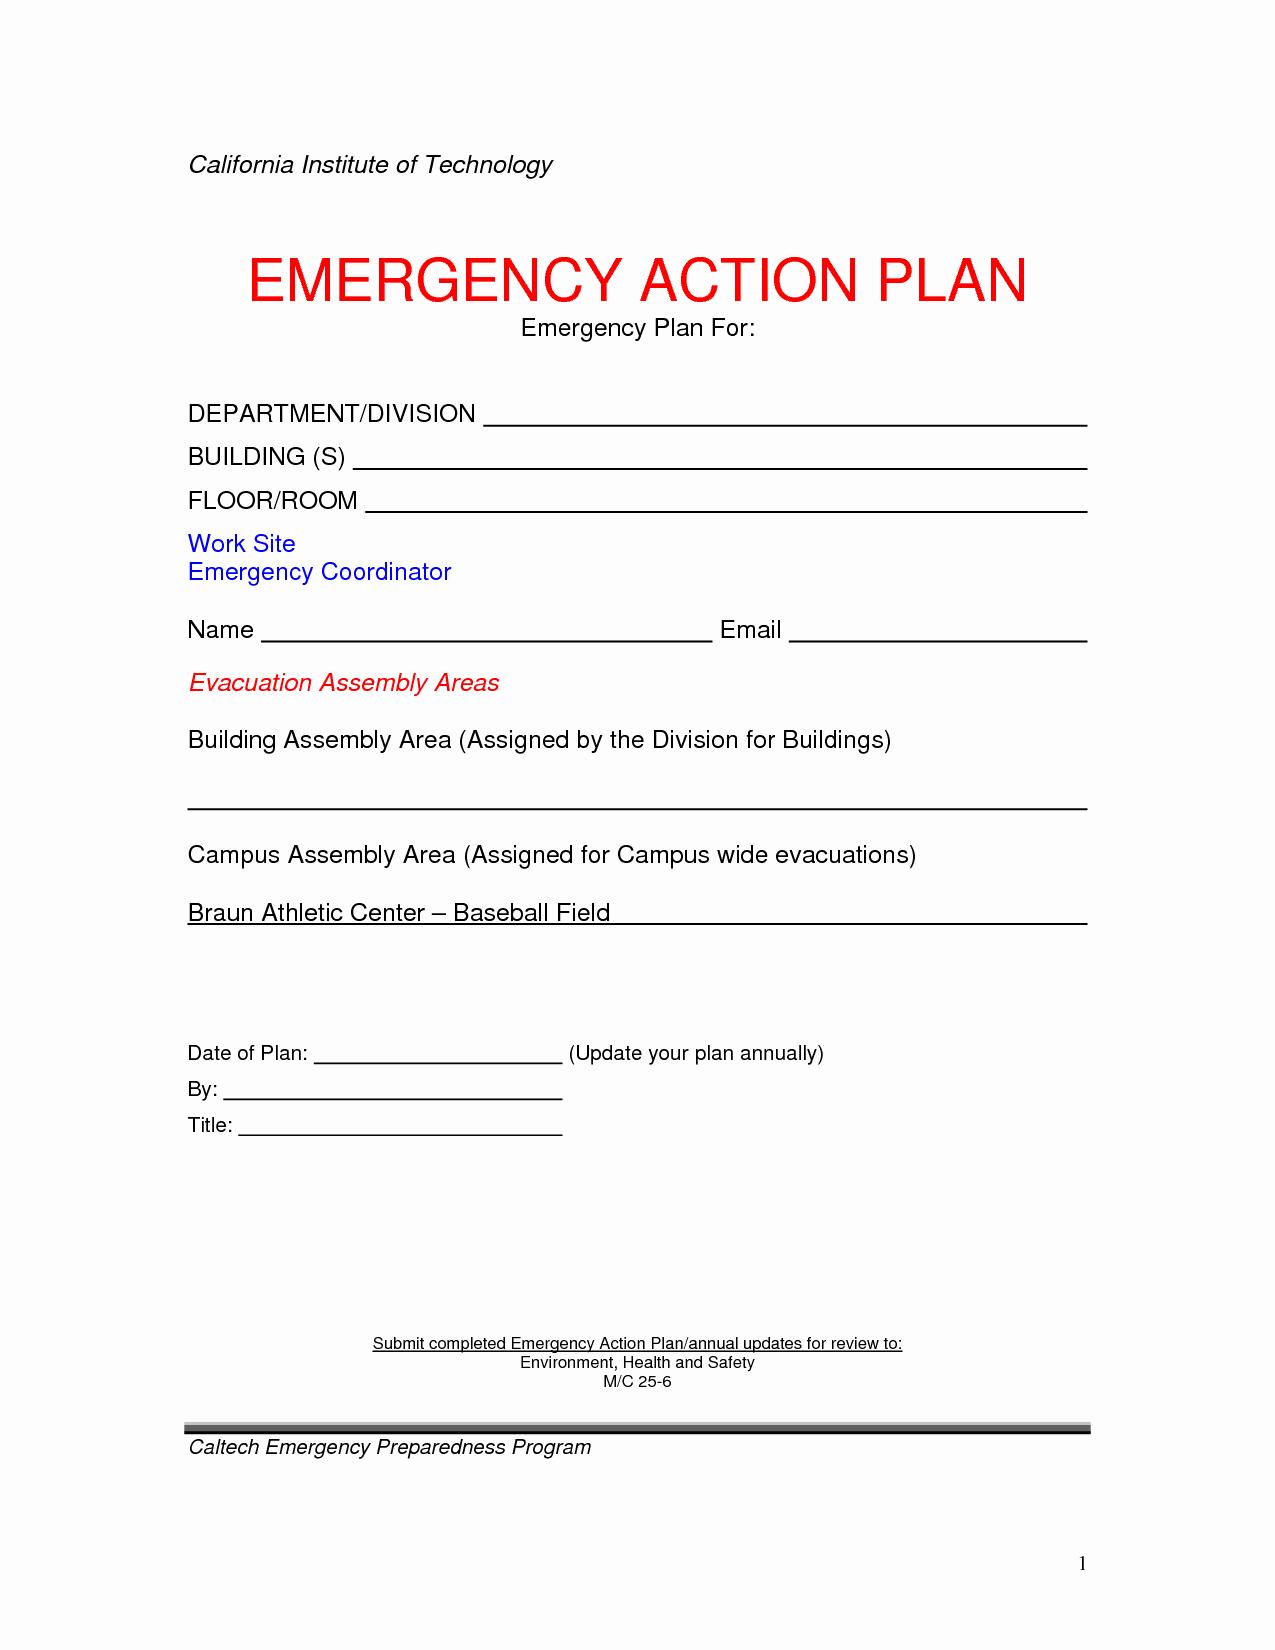 Emergency Action Plan Template Fresh Emergency Action Plan Template